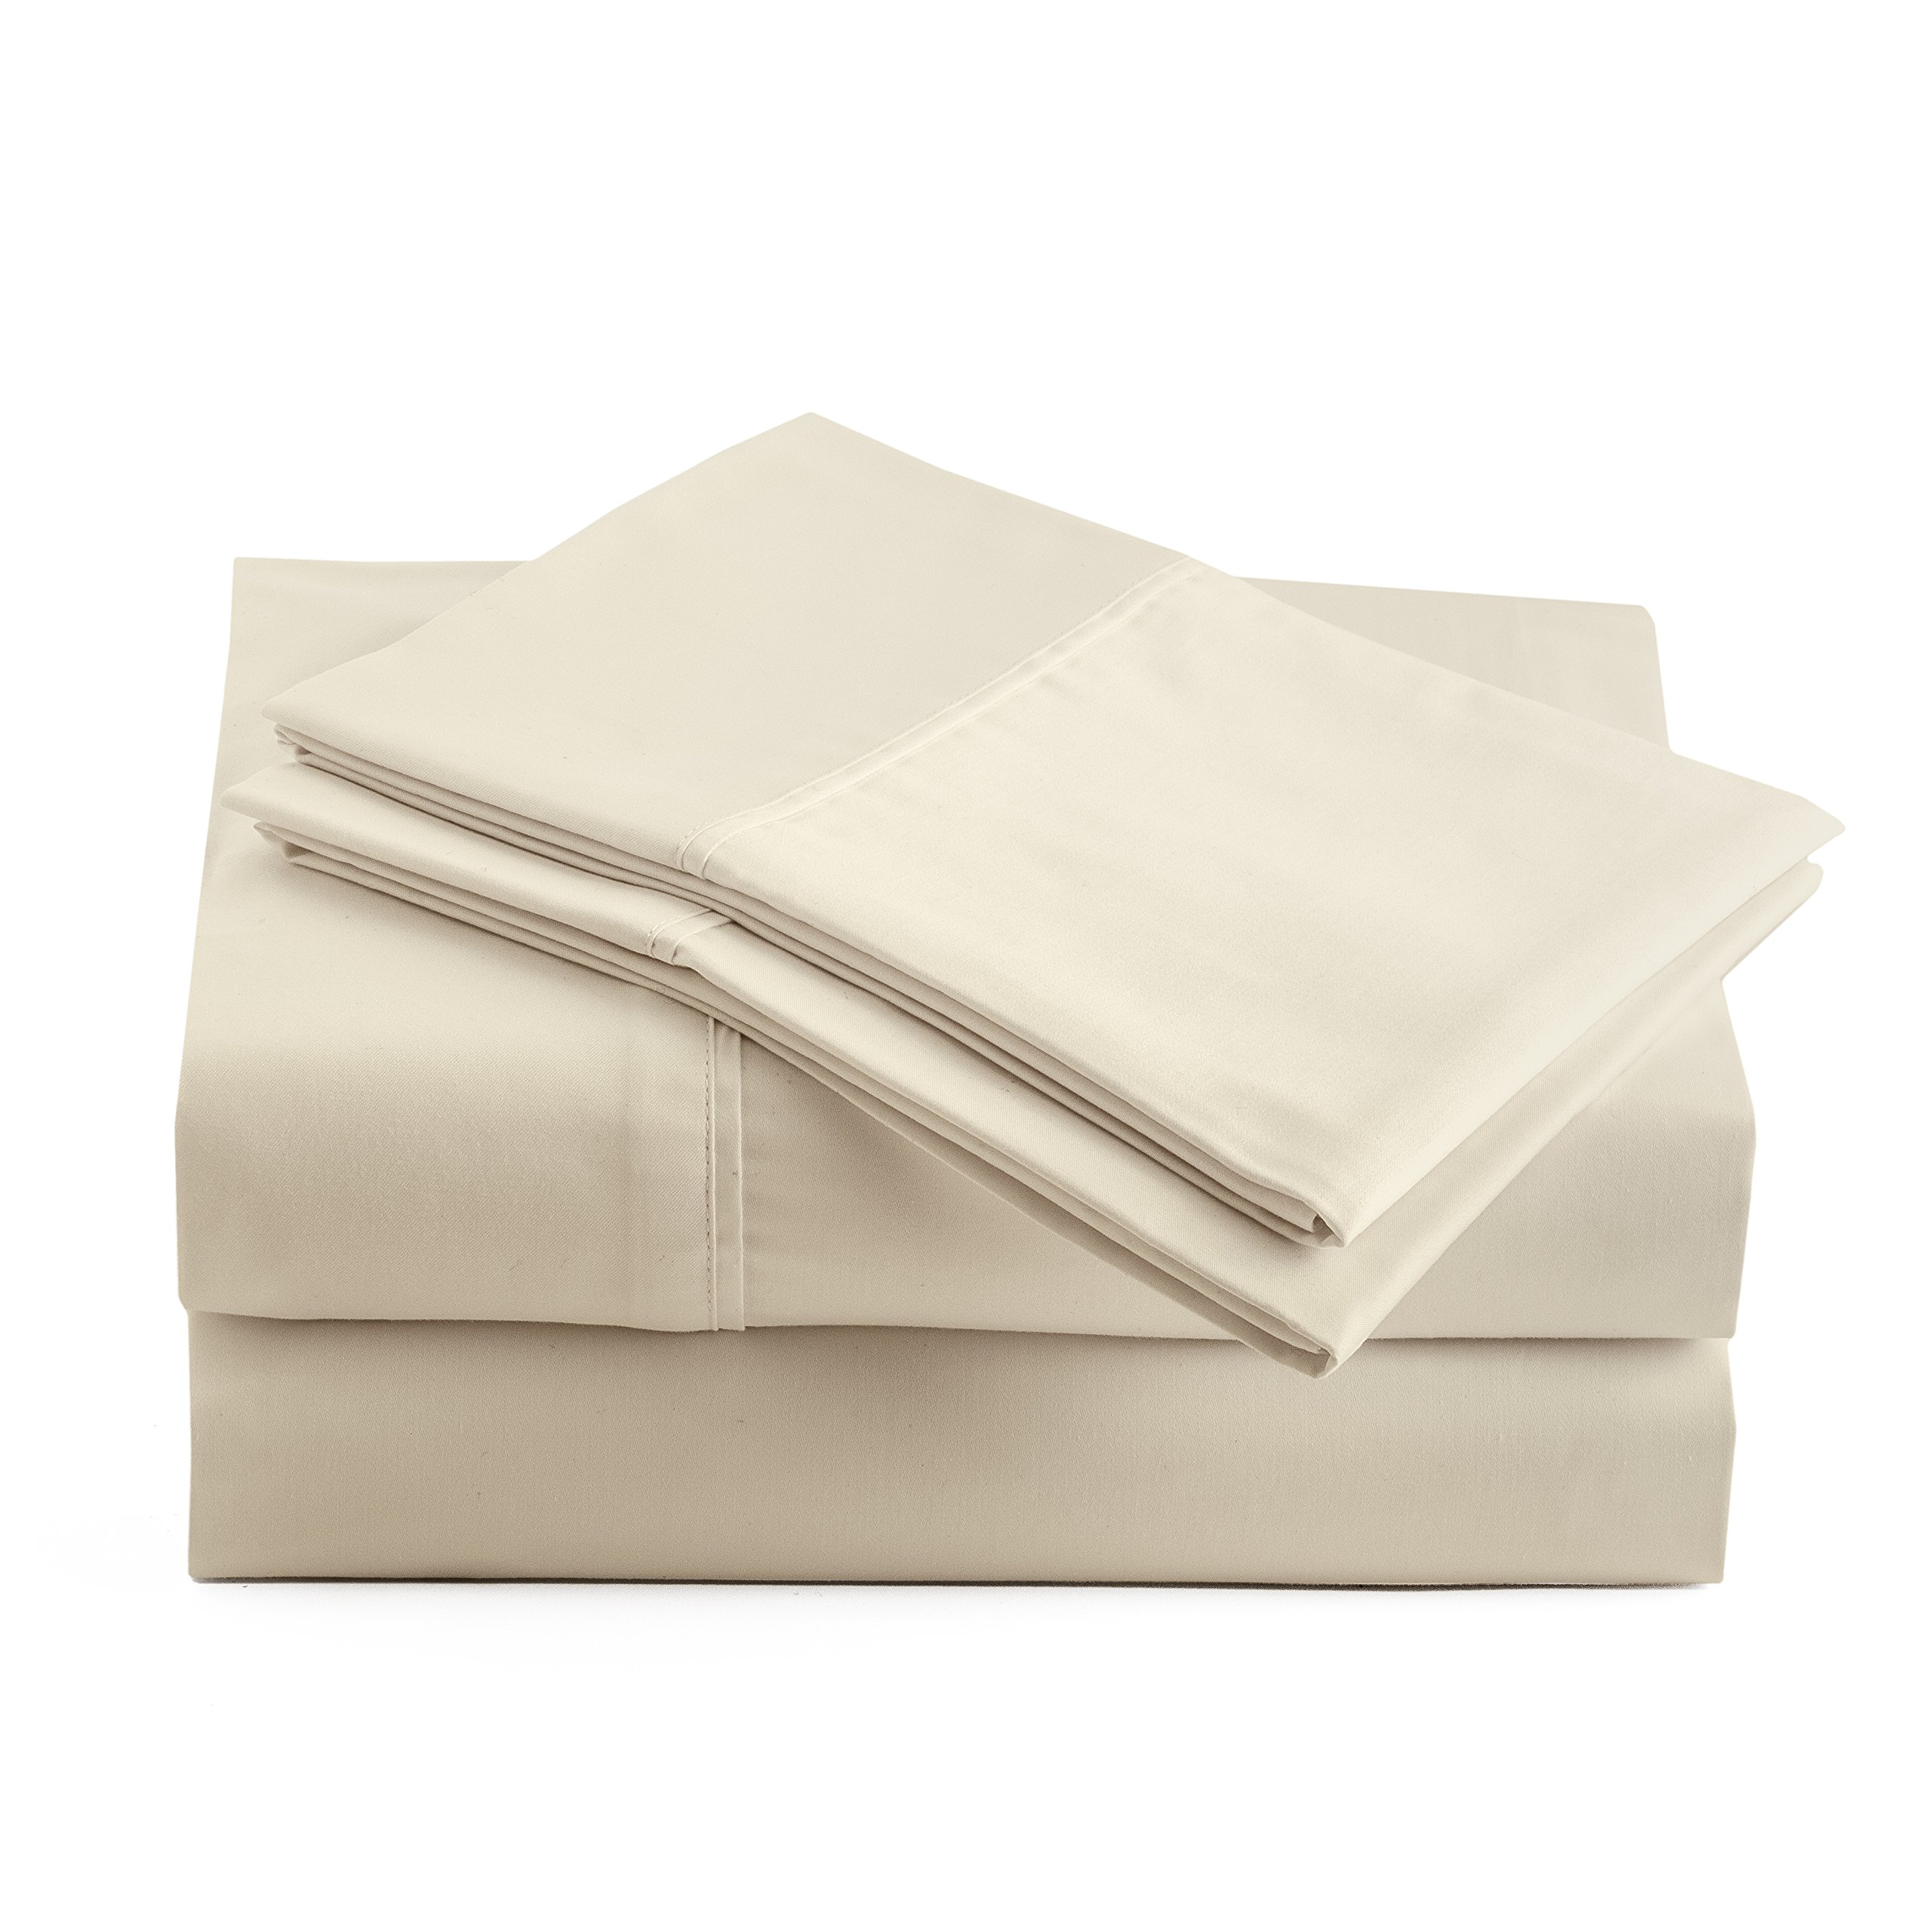 Peru Pima - 415 Thread Count - 100% Peruvian Pima Cotton - Percale - Bed Sheet Set (California King, Ivory)